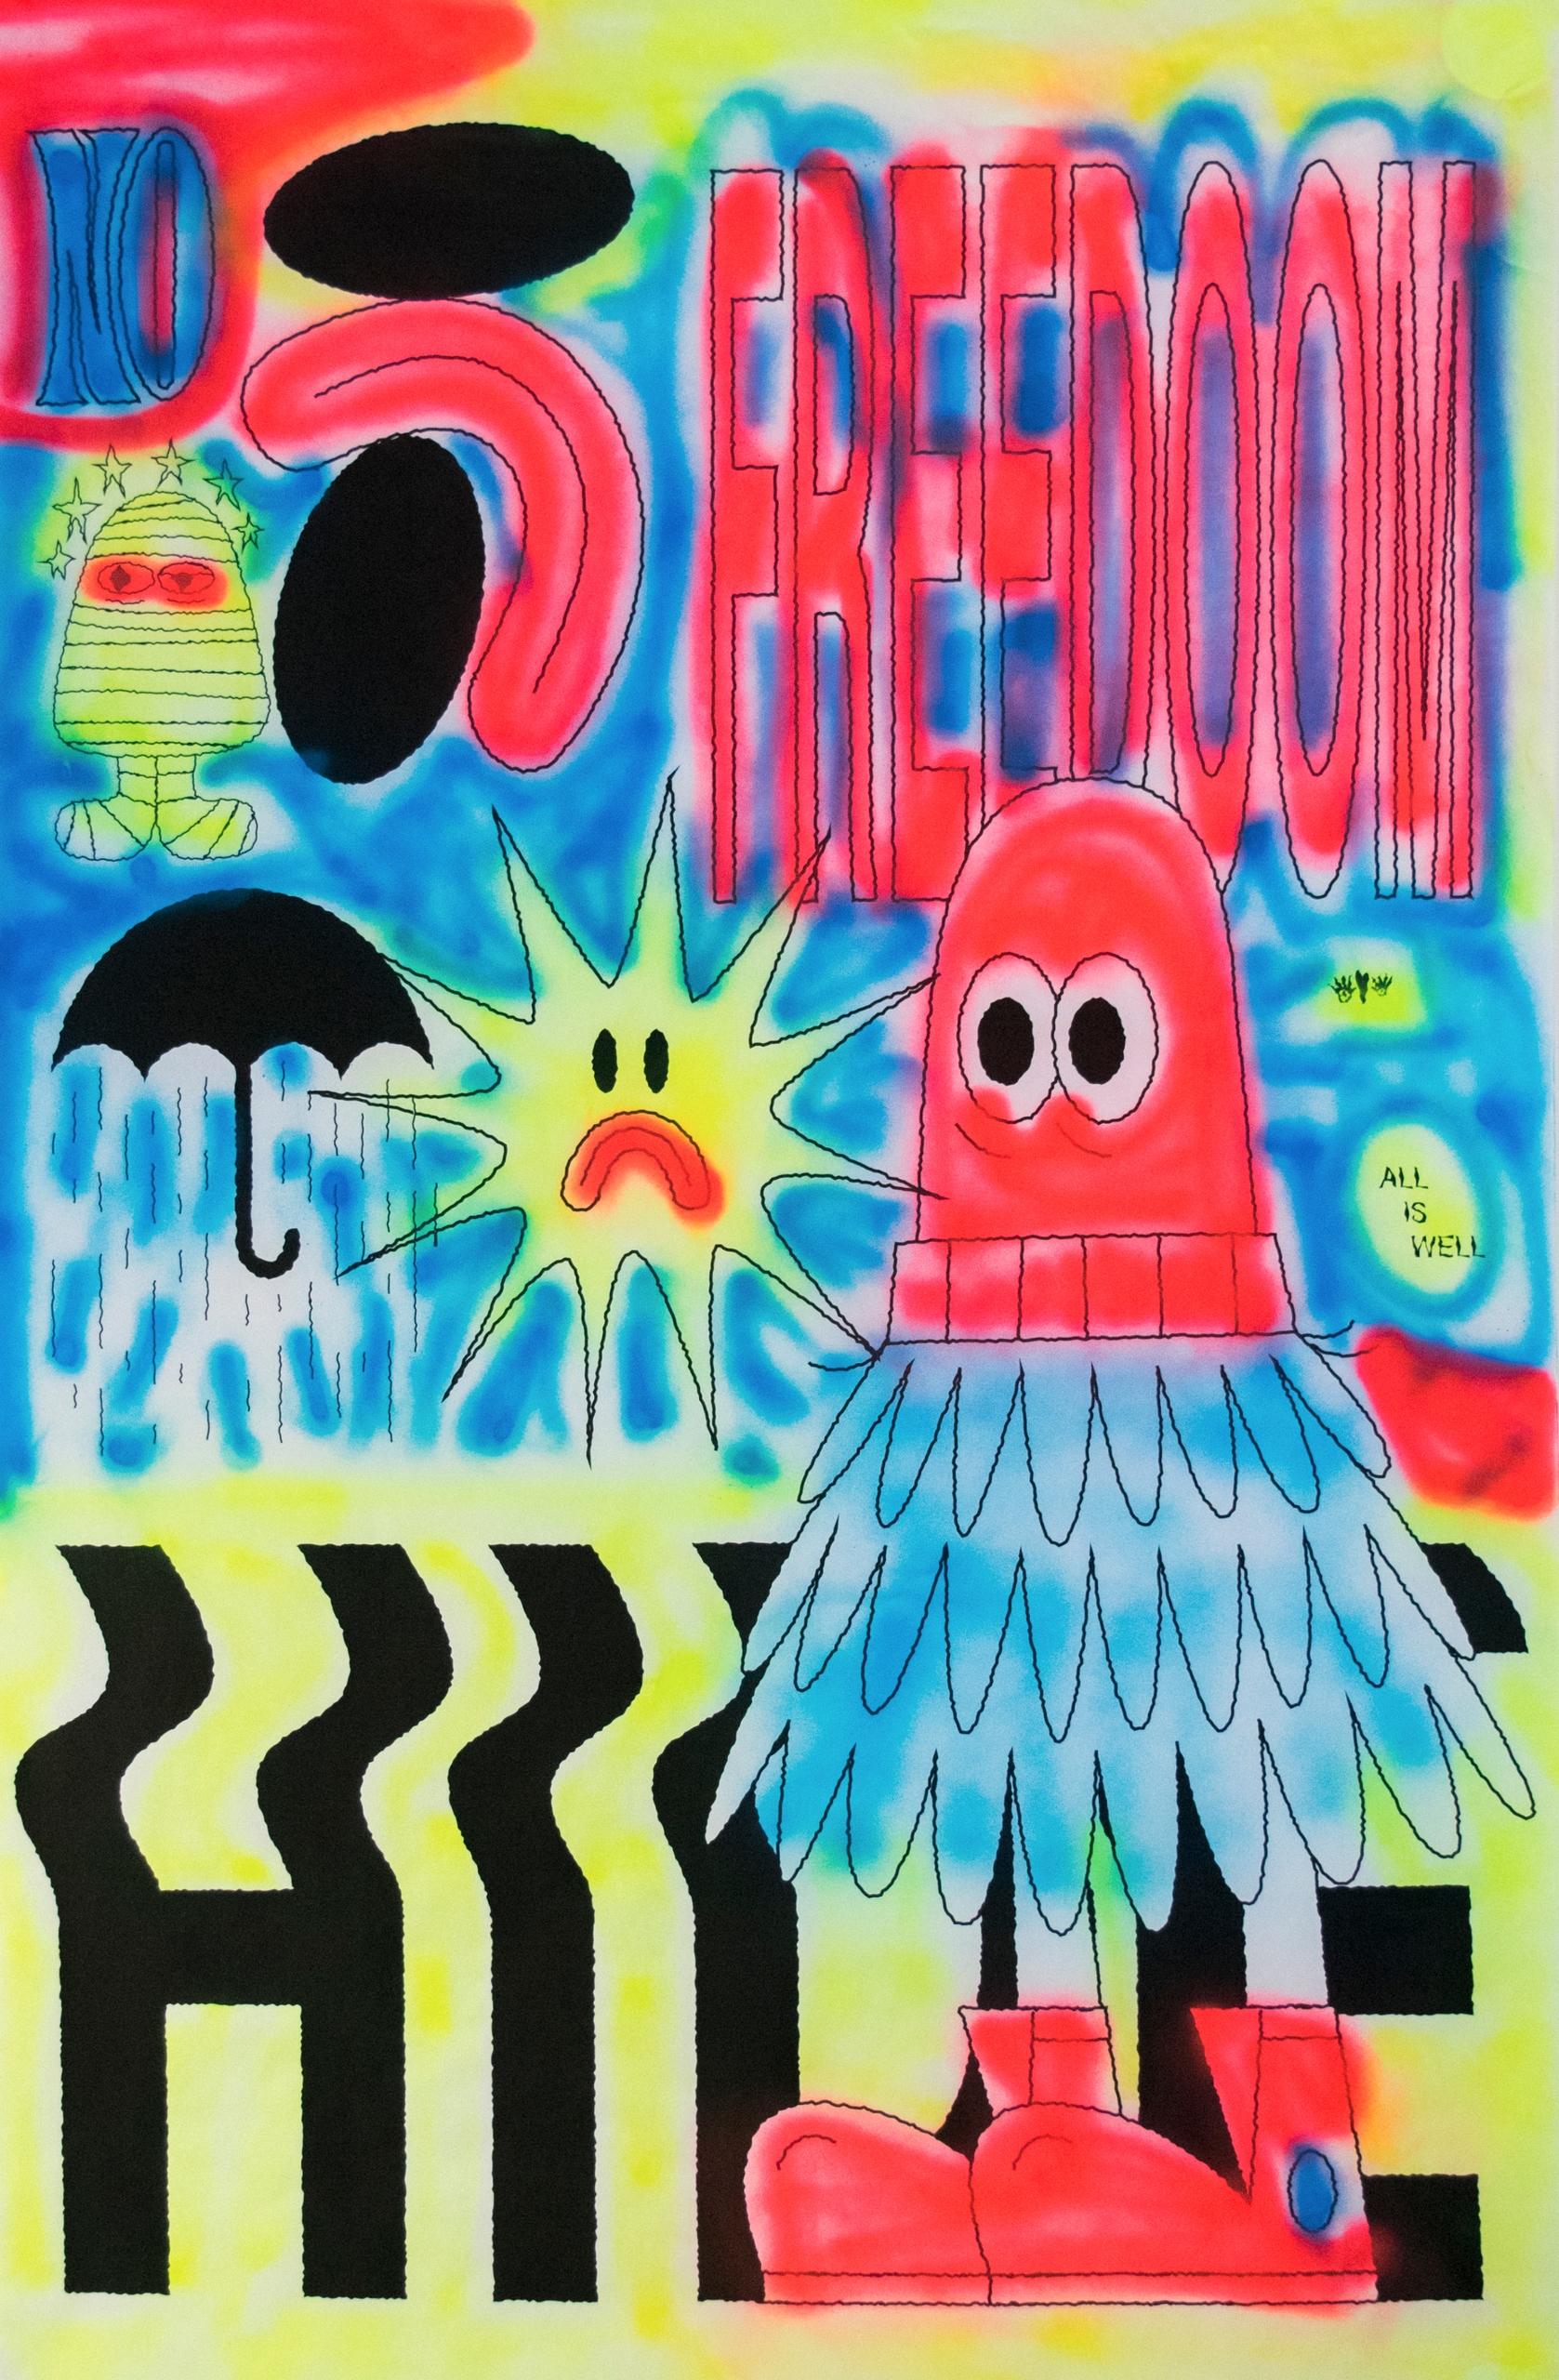 Final MASH Poster. 60 40 - 1 Se - mattluckhurst | ello